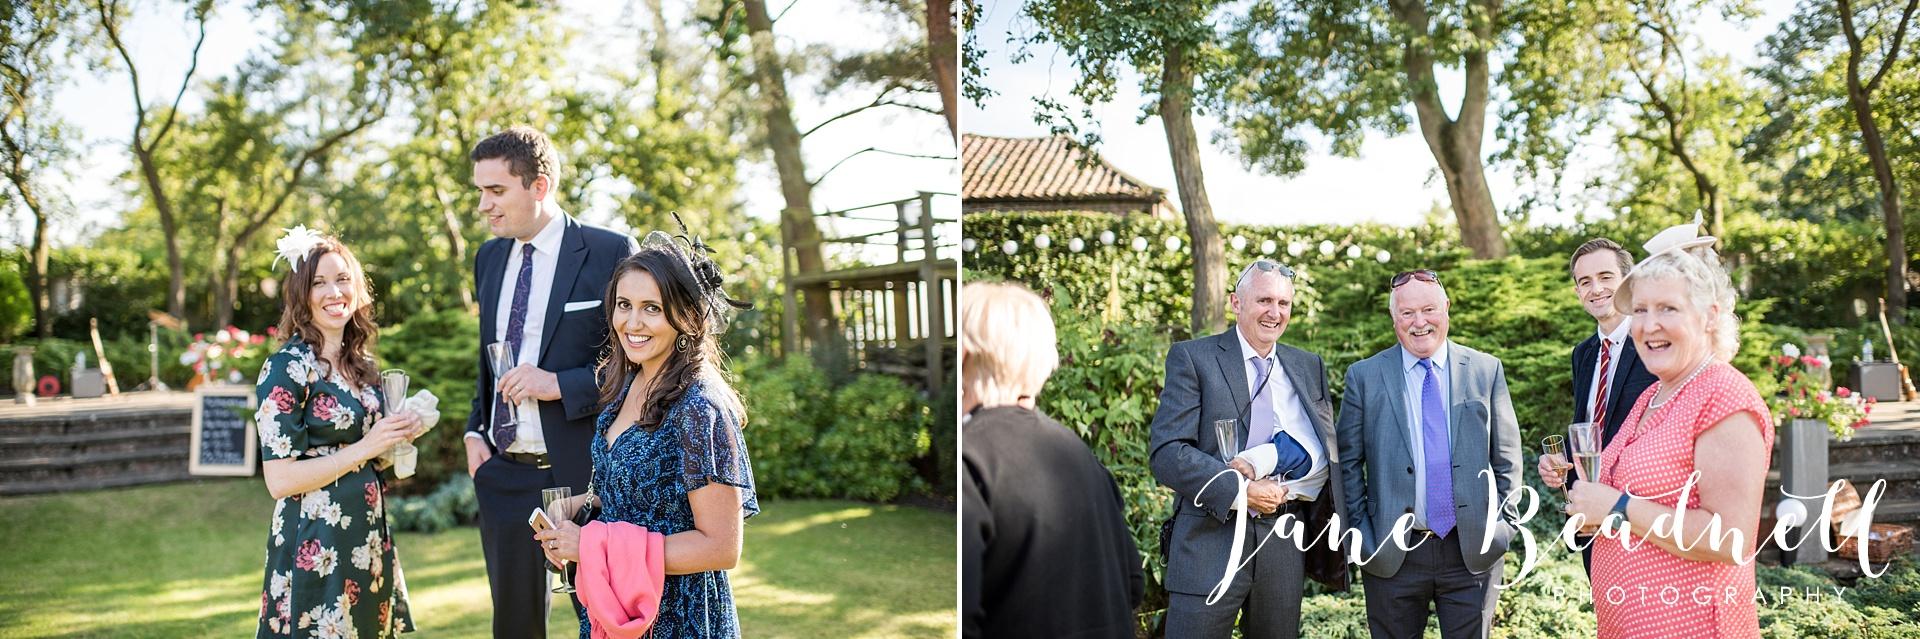 fine-art-wedding-photographer-jane-beadnell-yorkshire-wedding-photographer-garden-wedding_0080